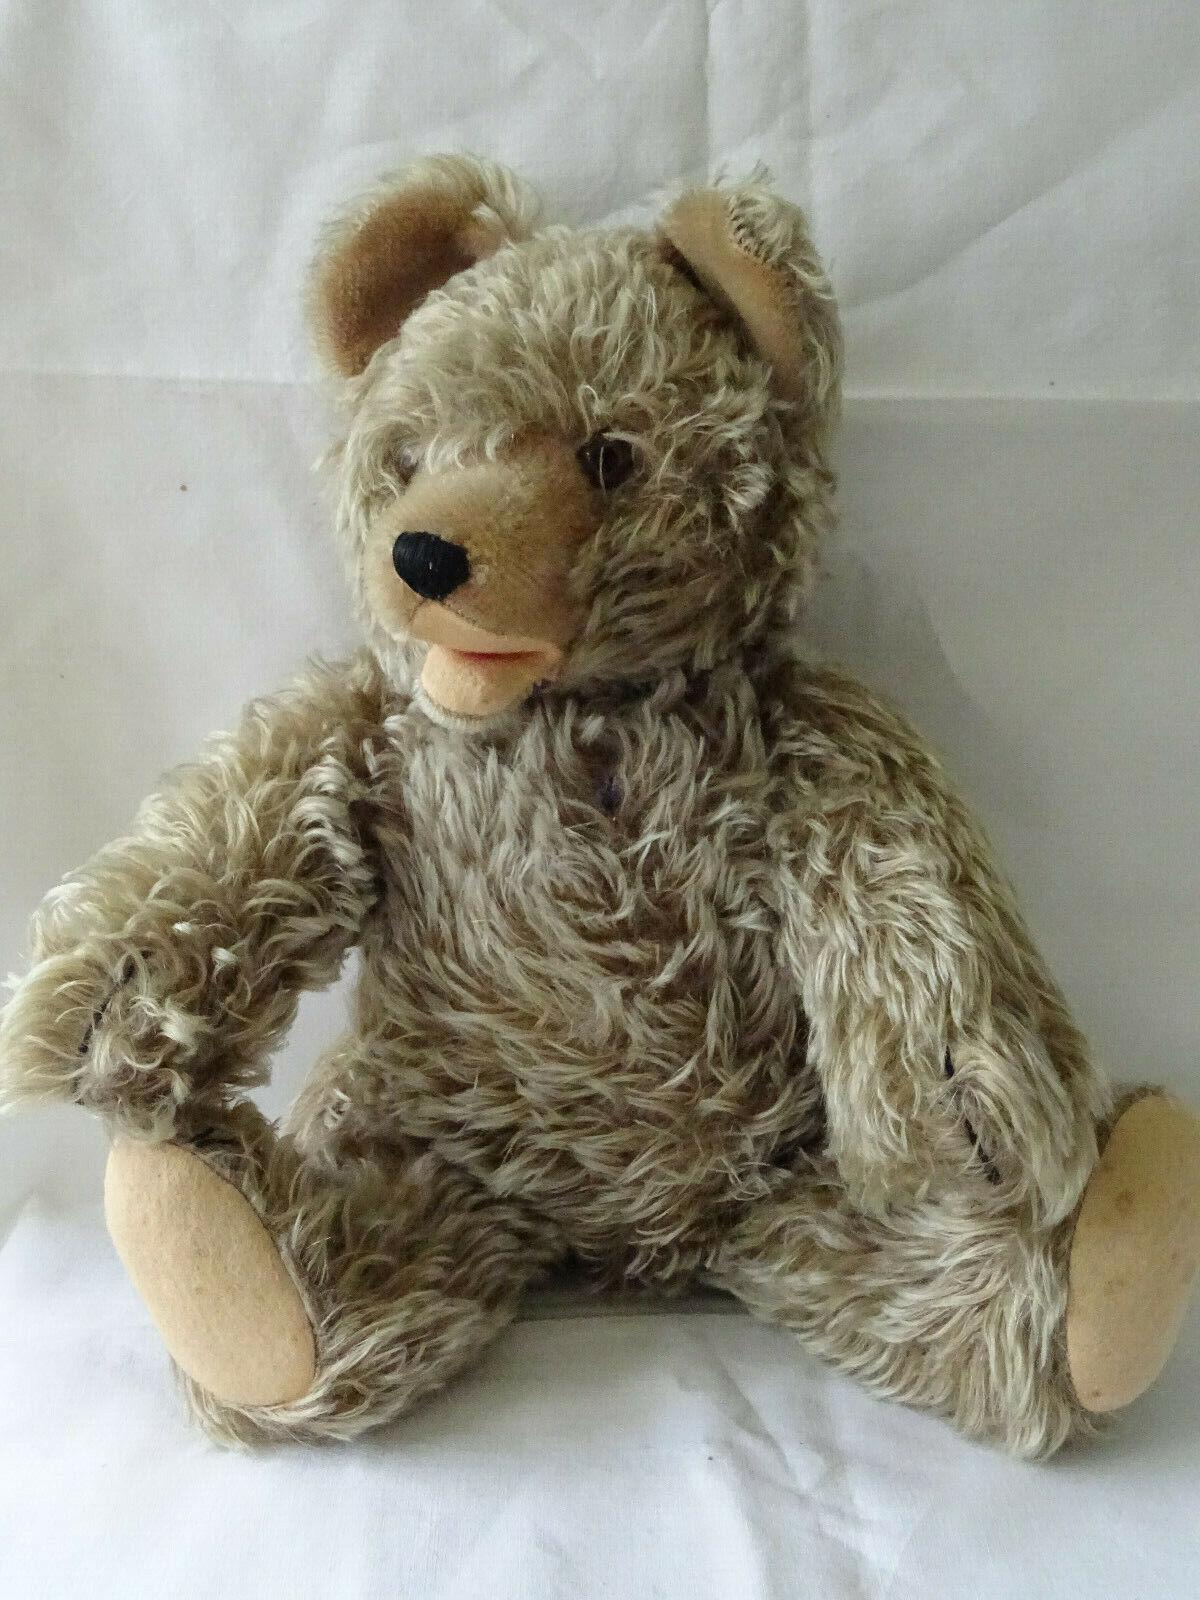 Alt Teddy Teddybär Hermann Stoffteddy  Stofftier Bär Baer Zotty  43cm 1950